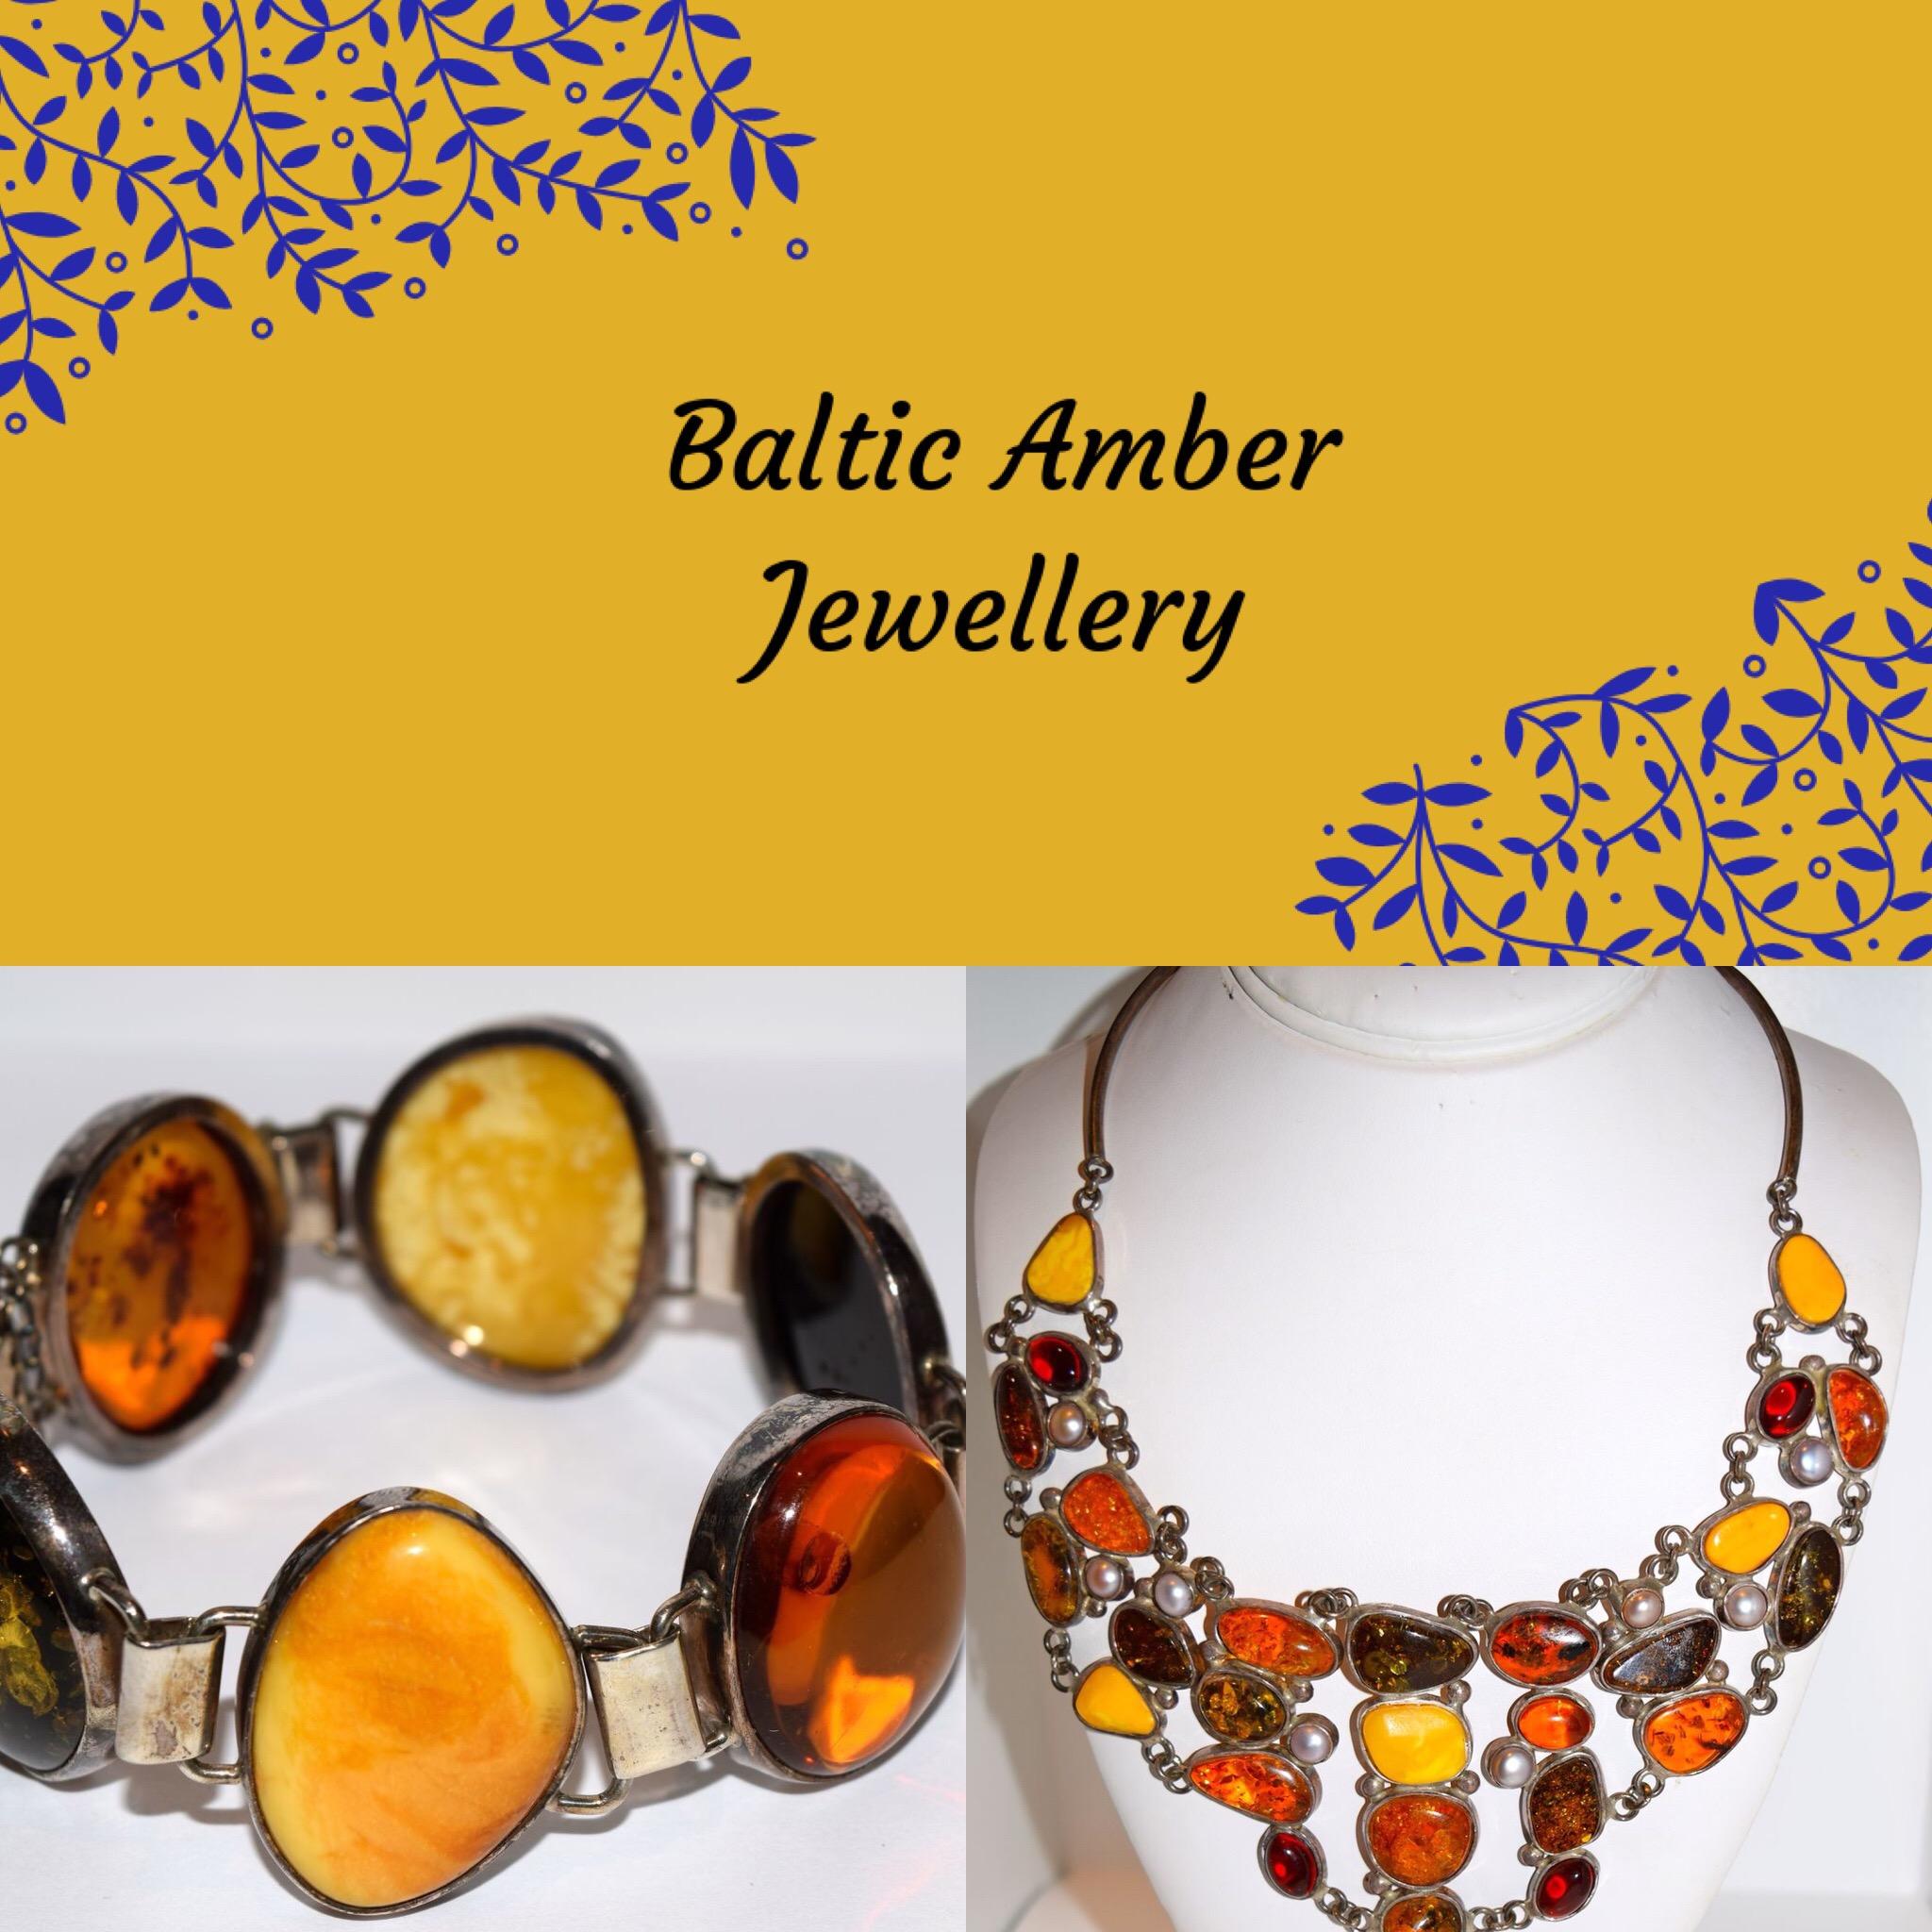 Baltic Amber Jewellery